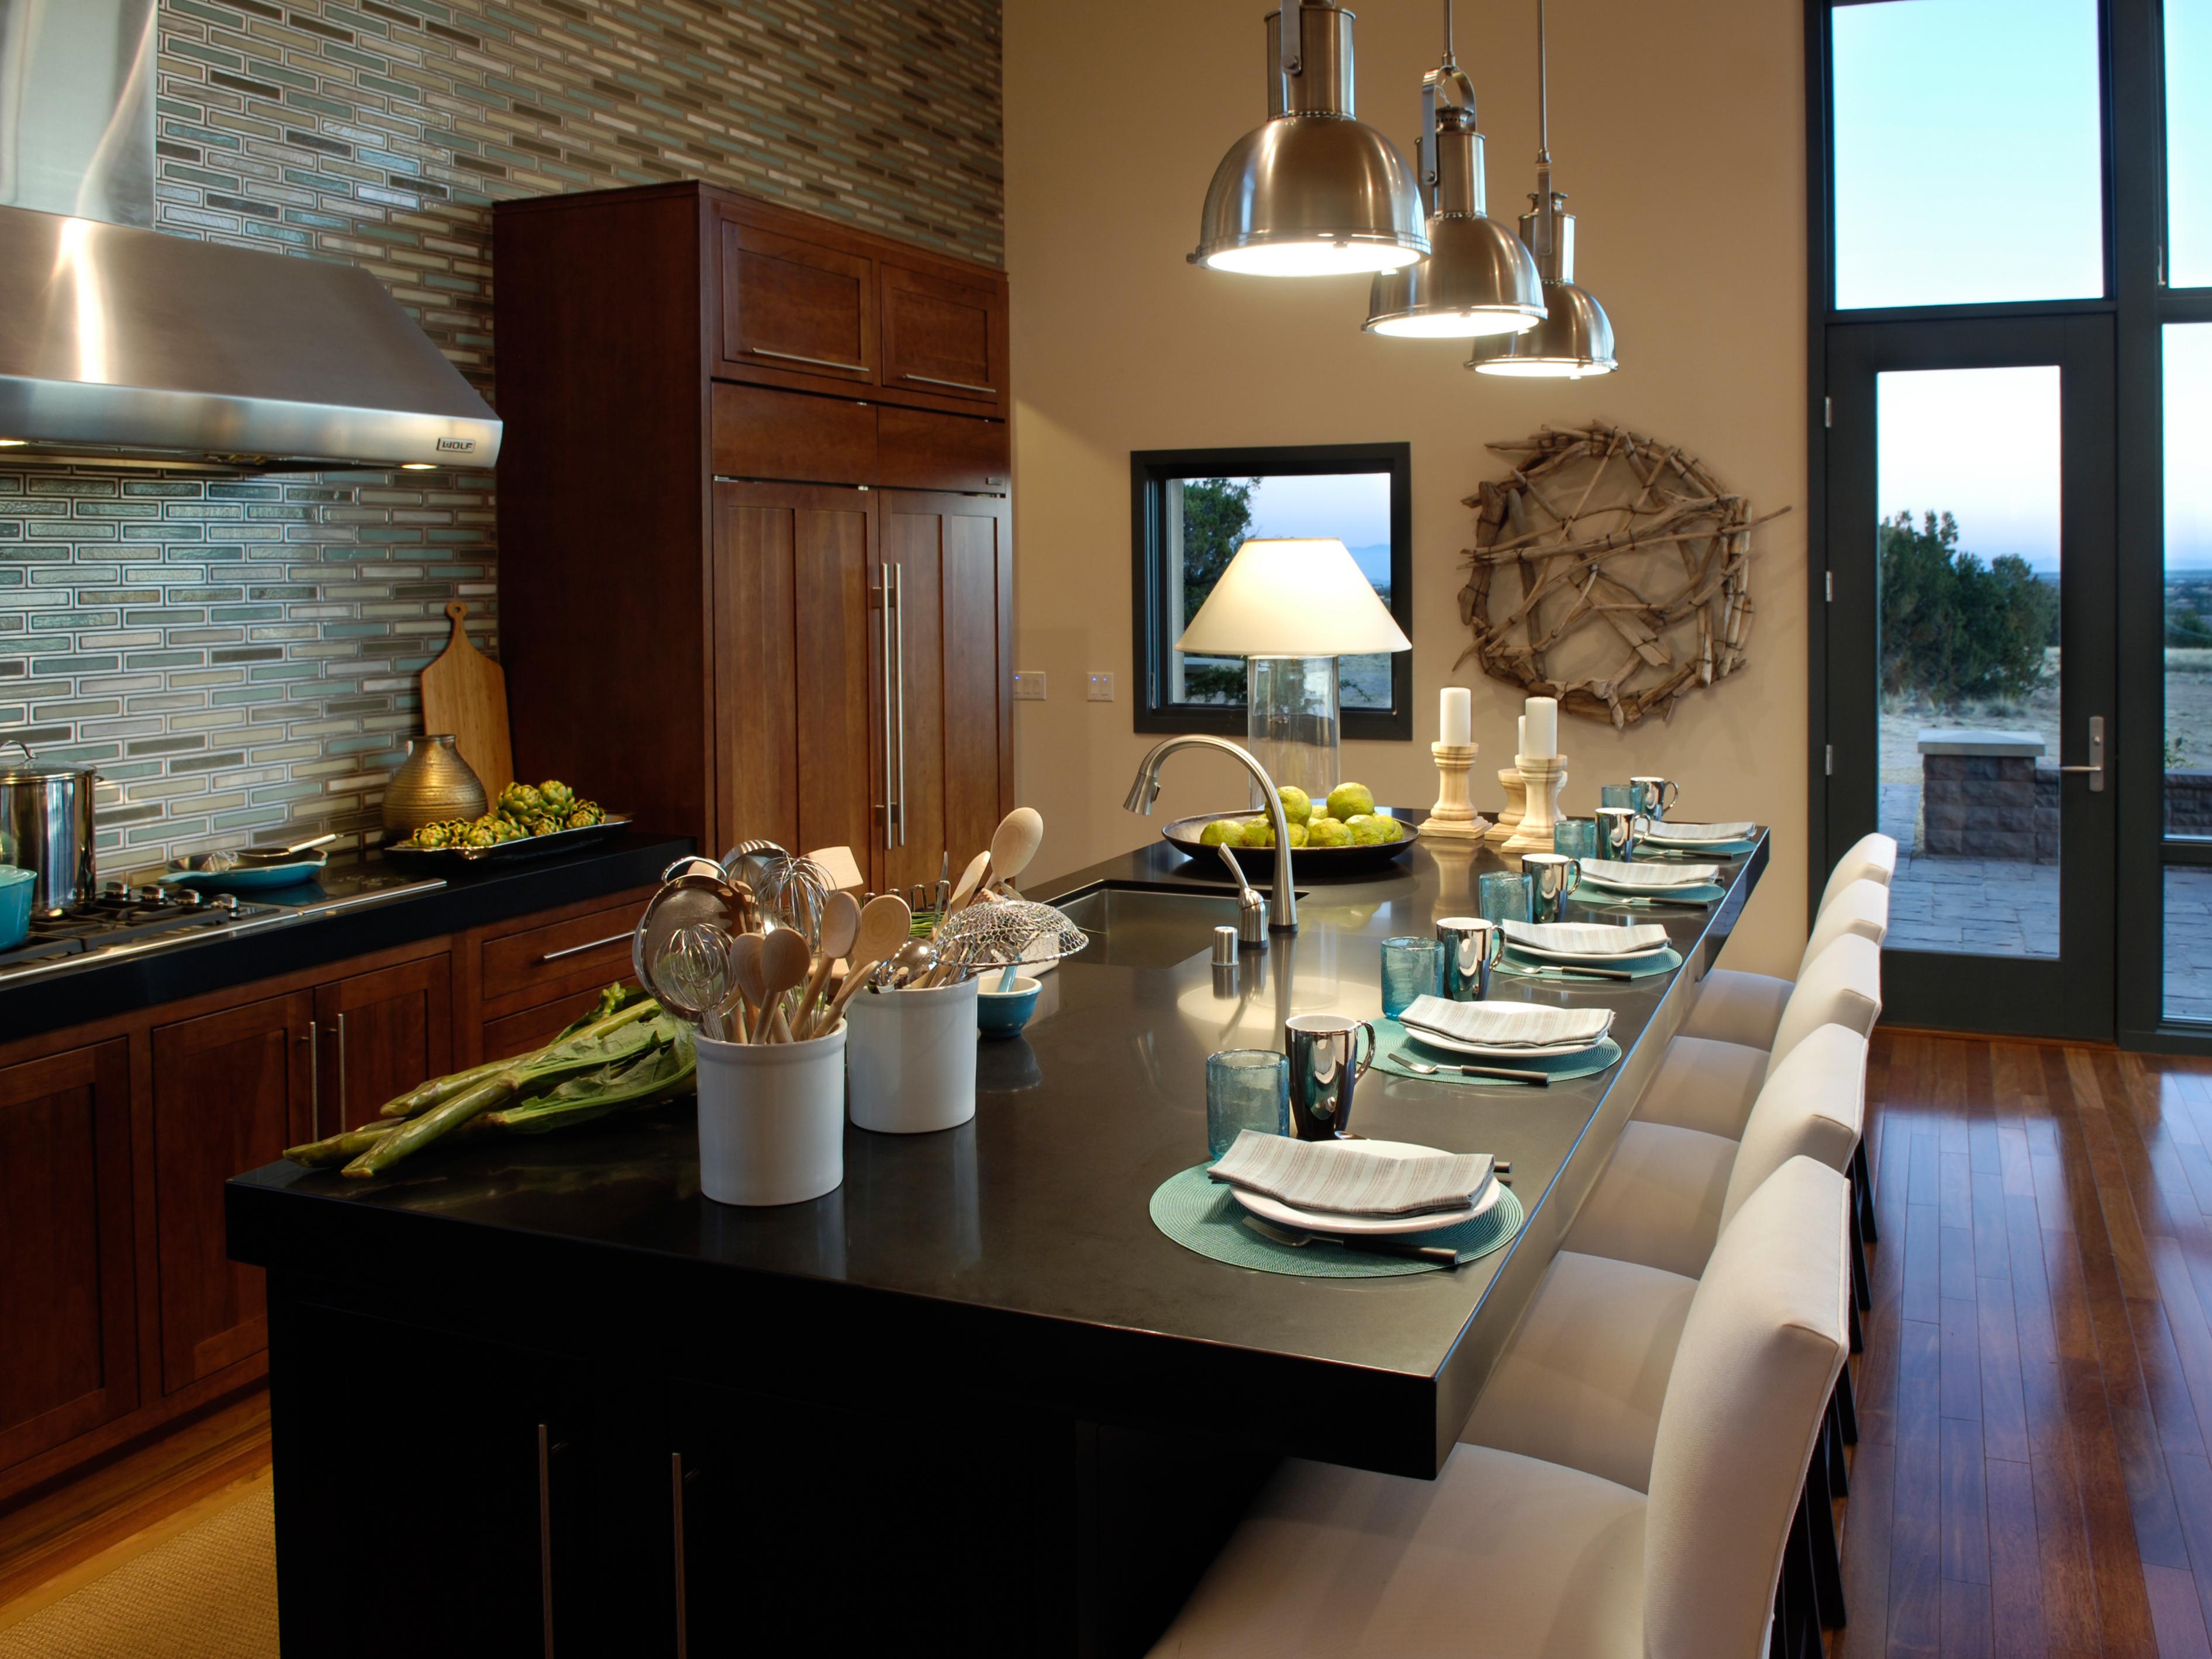 Kitchen Designers Perth Uk Sarkemnet - Kitchen design scotland